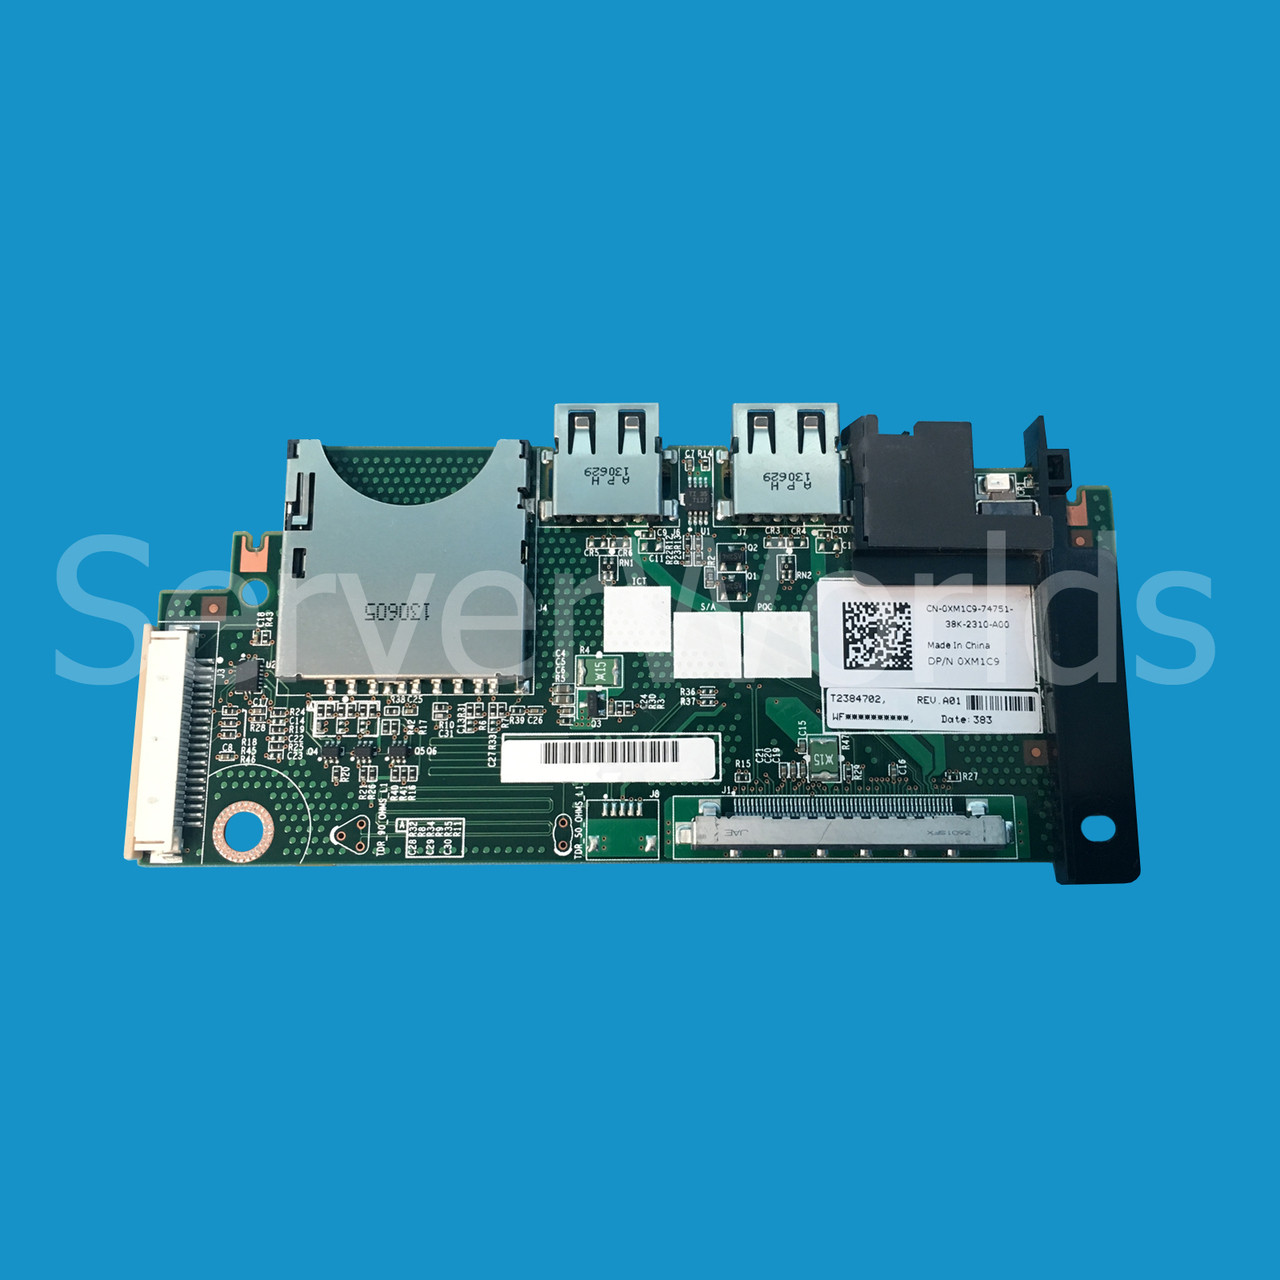 Dell XM1C9   Poweredge R620 Control Panel Board - Serverworlds